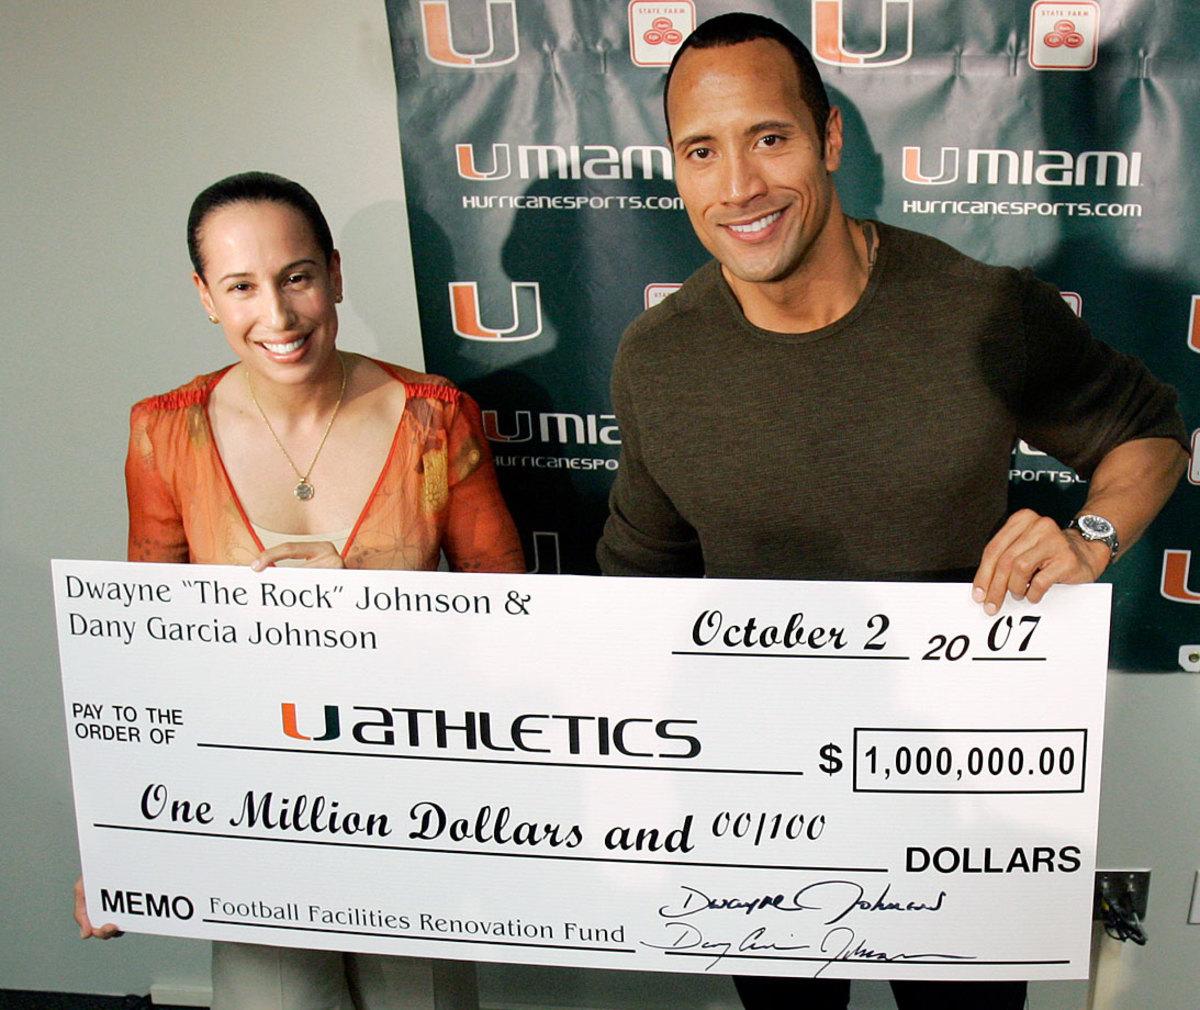 2007-Dwayne-The-Rock-Johnson-ex-wife-Dany-Garcia-Miami-donation.jpg